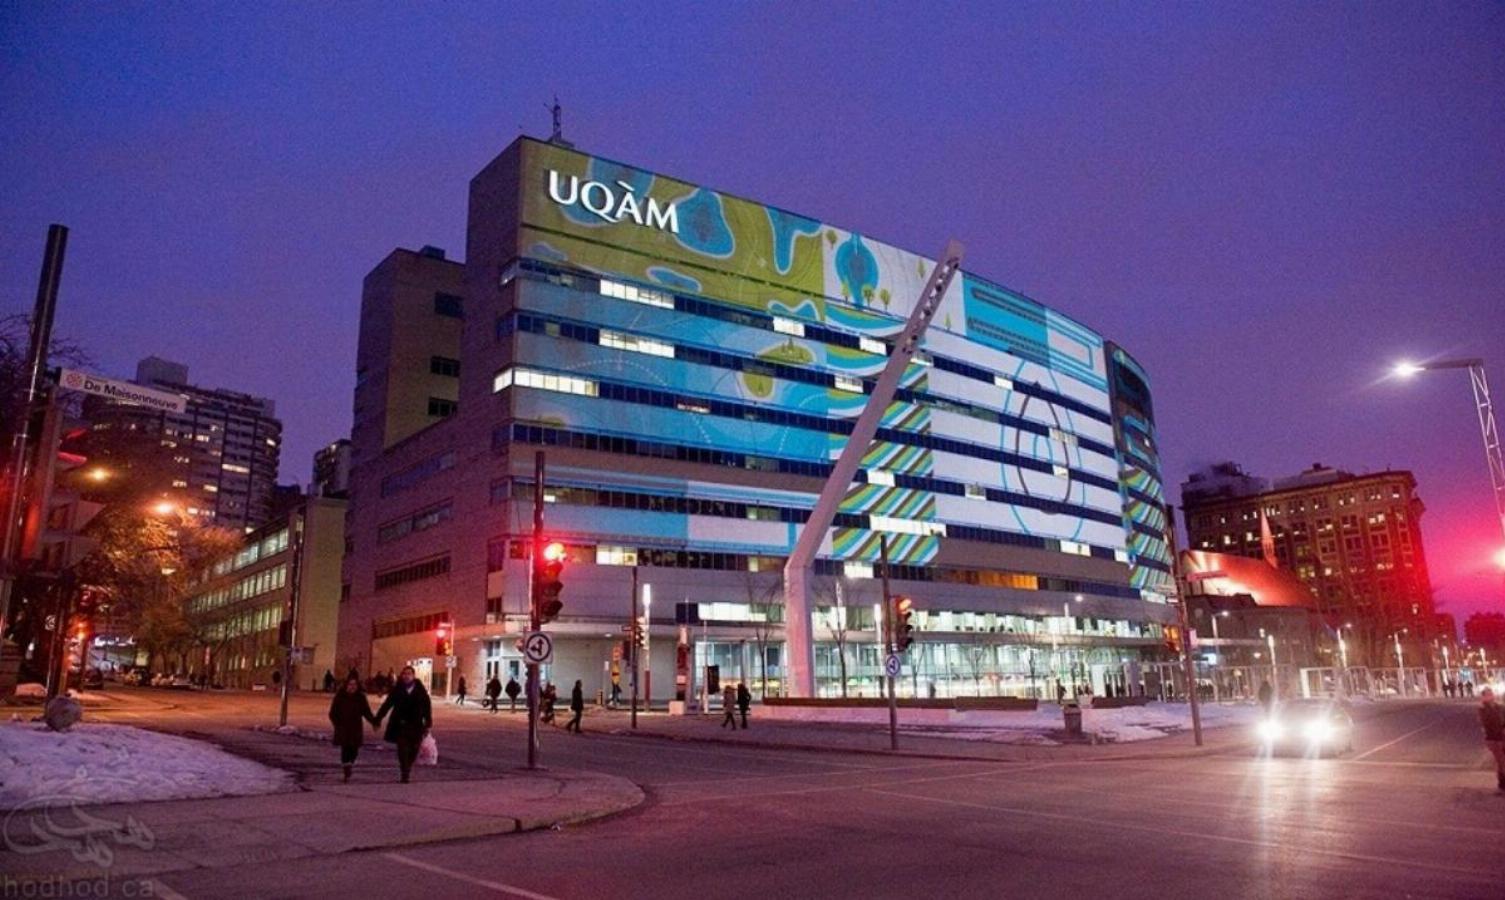 معرفی دانشگاه یوکم UQÀM: Université du Québec à Montréal